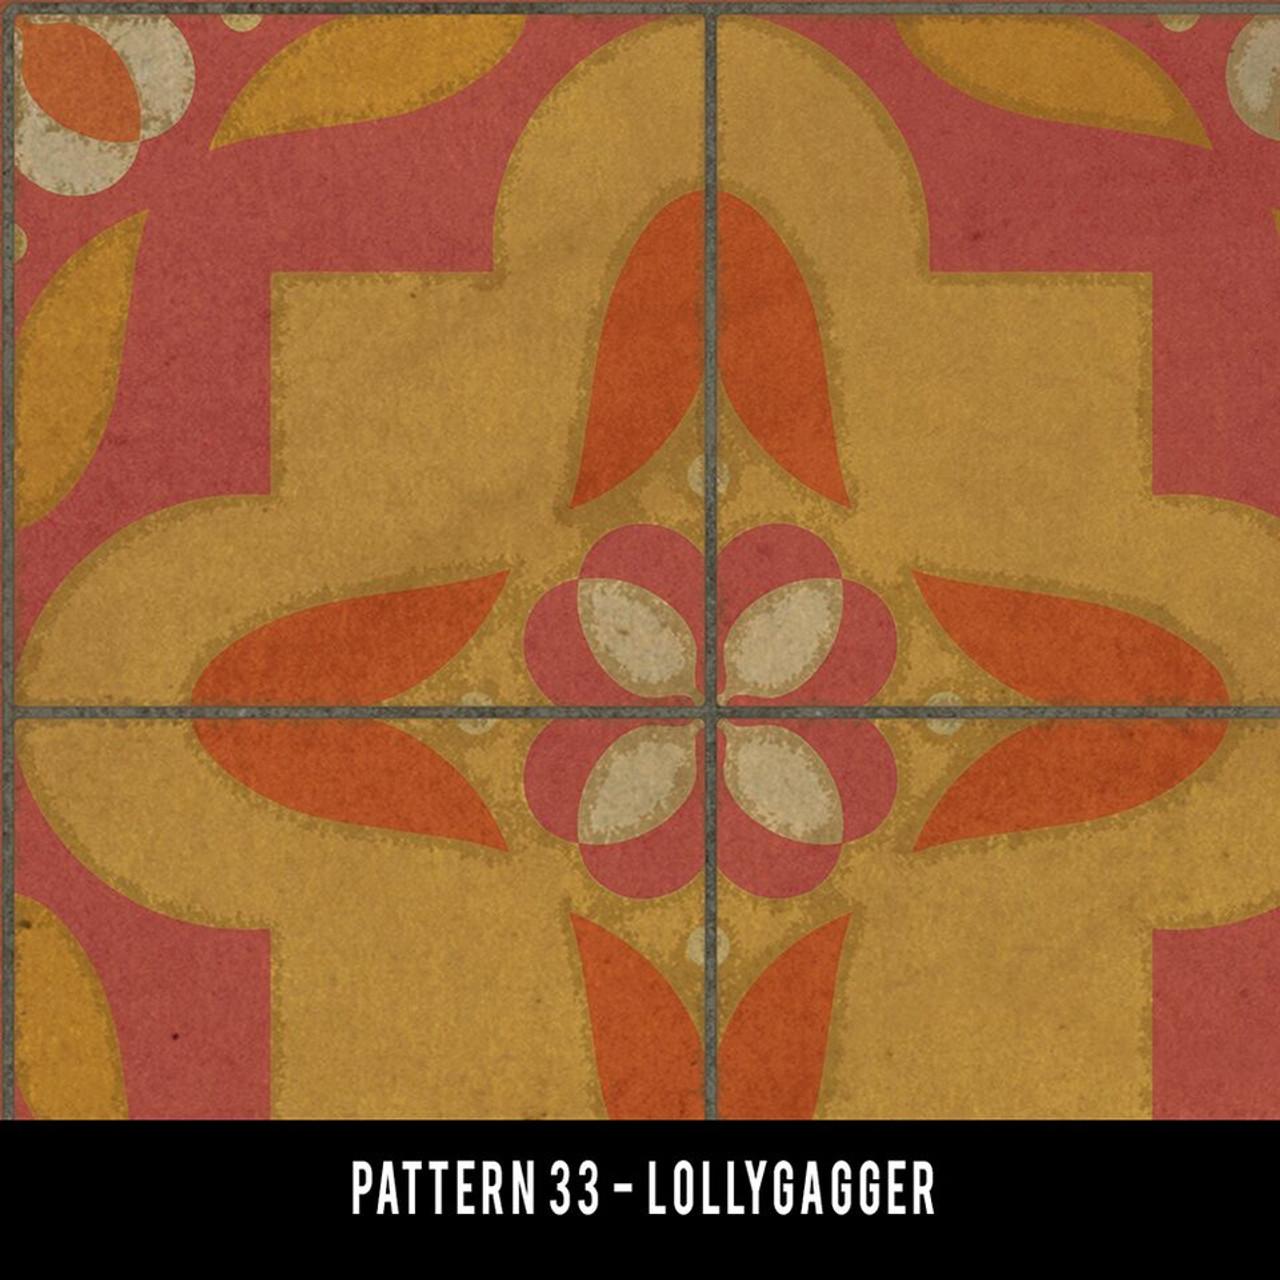 Swatches for Pattern 33 - vinyl floor cloths